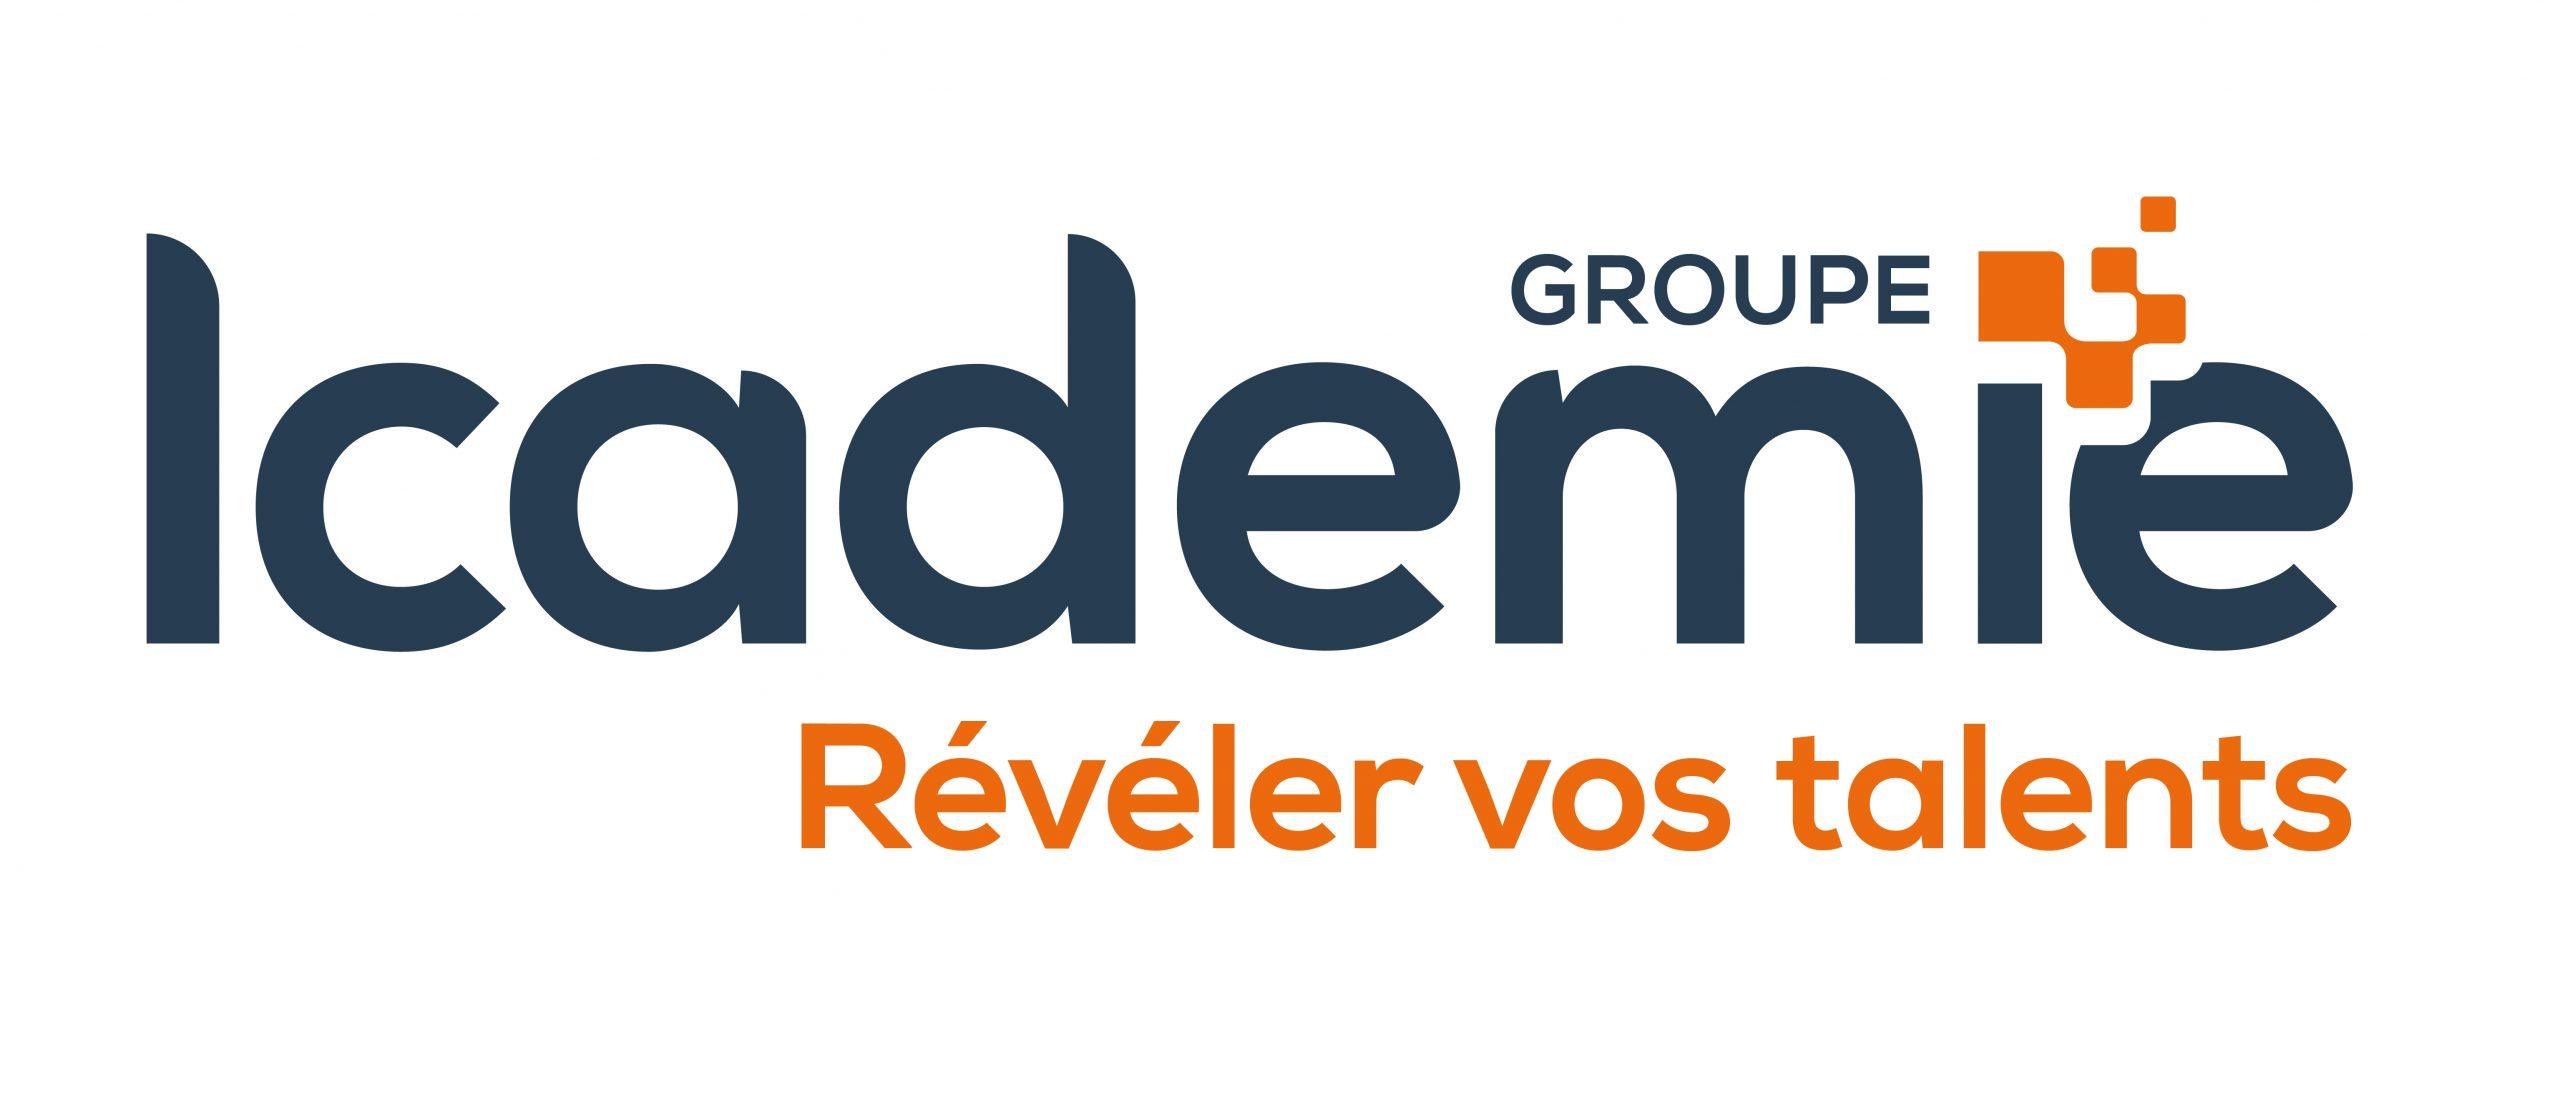 Icademie_Groupe_Logo_Plan de travail 1